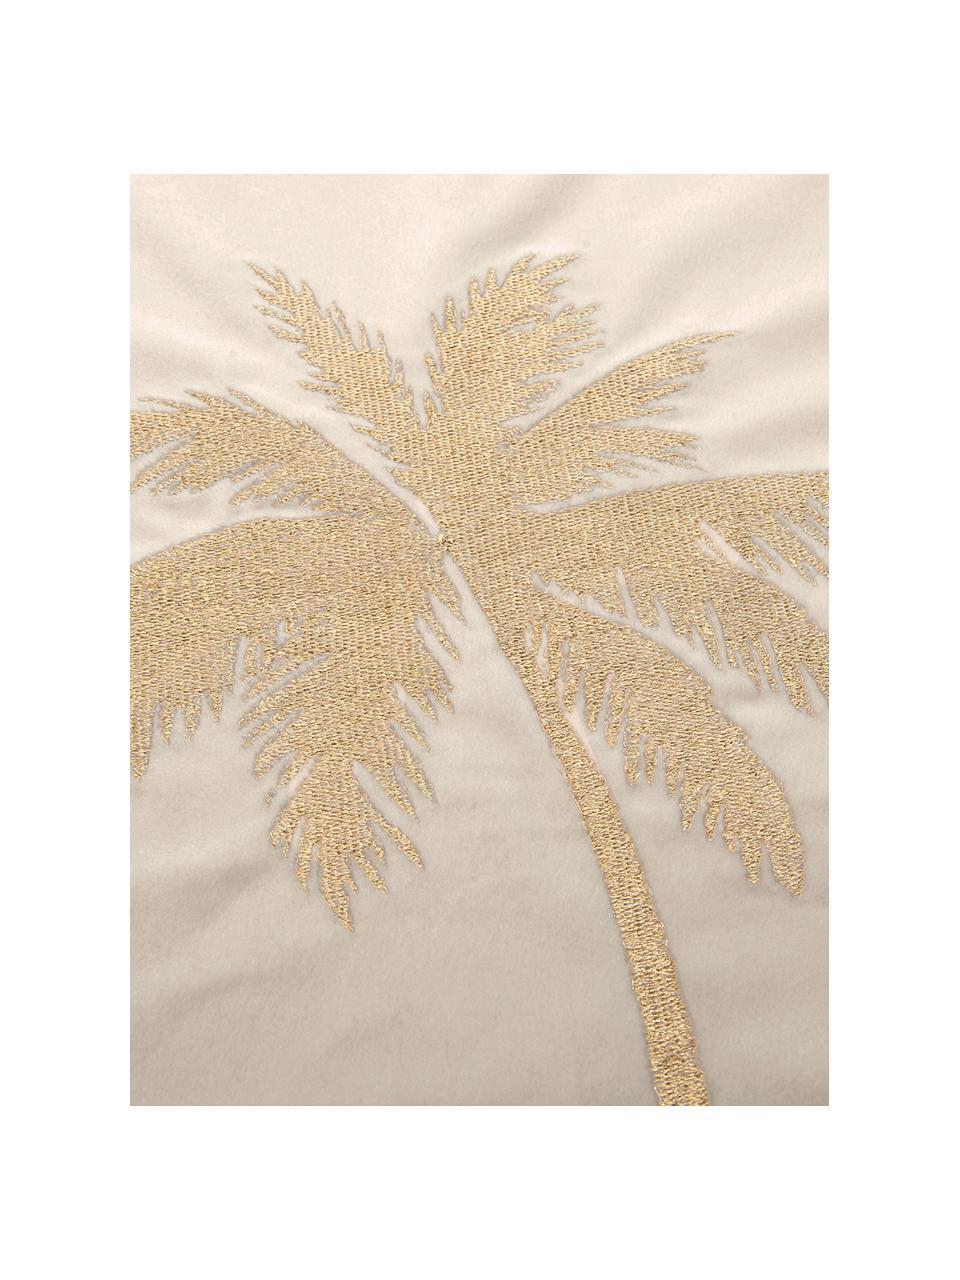 Glanzende fluwelen kussenhoes Palmsprings met borduurwerk, 100% polyester fluweel, Crèmewit, goudkleurig, 40 x 40 cm